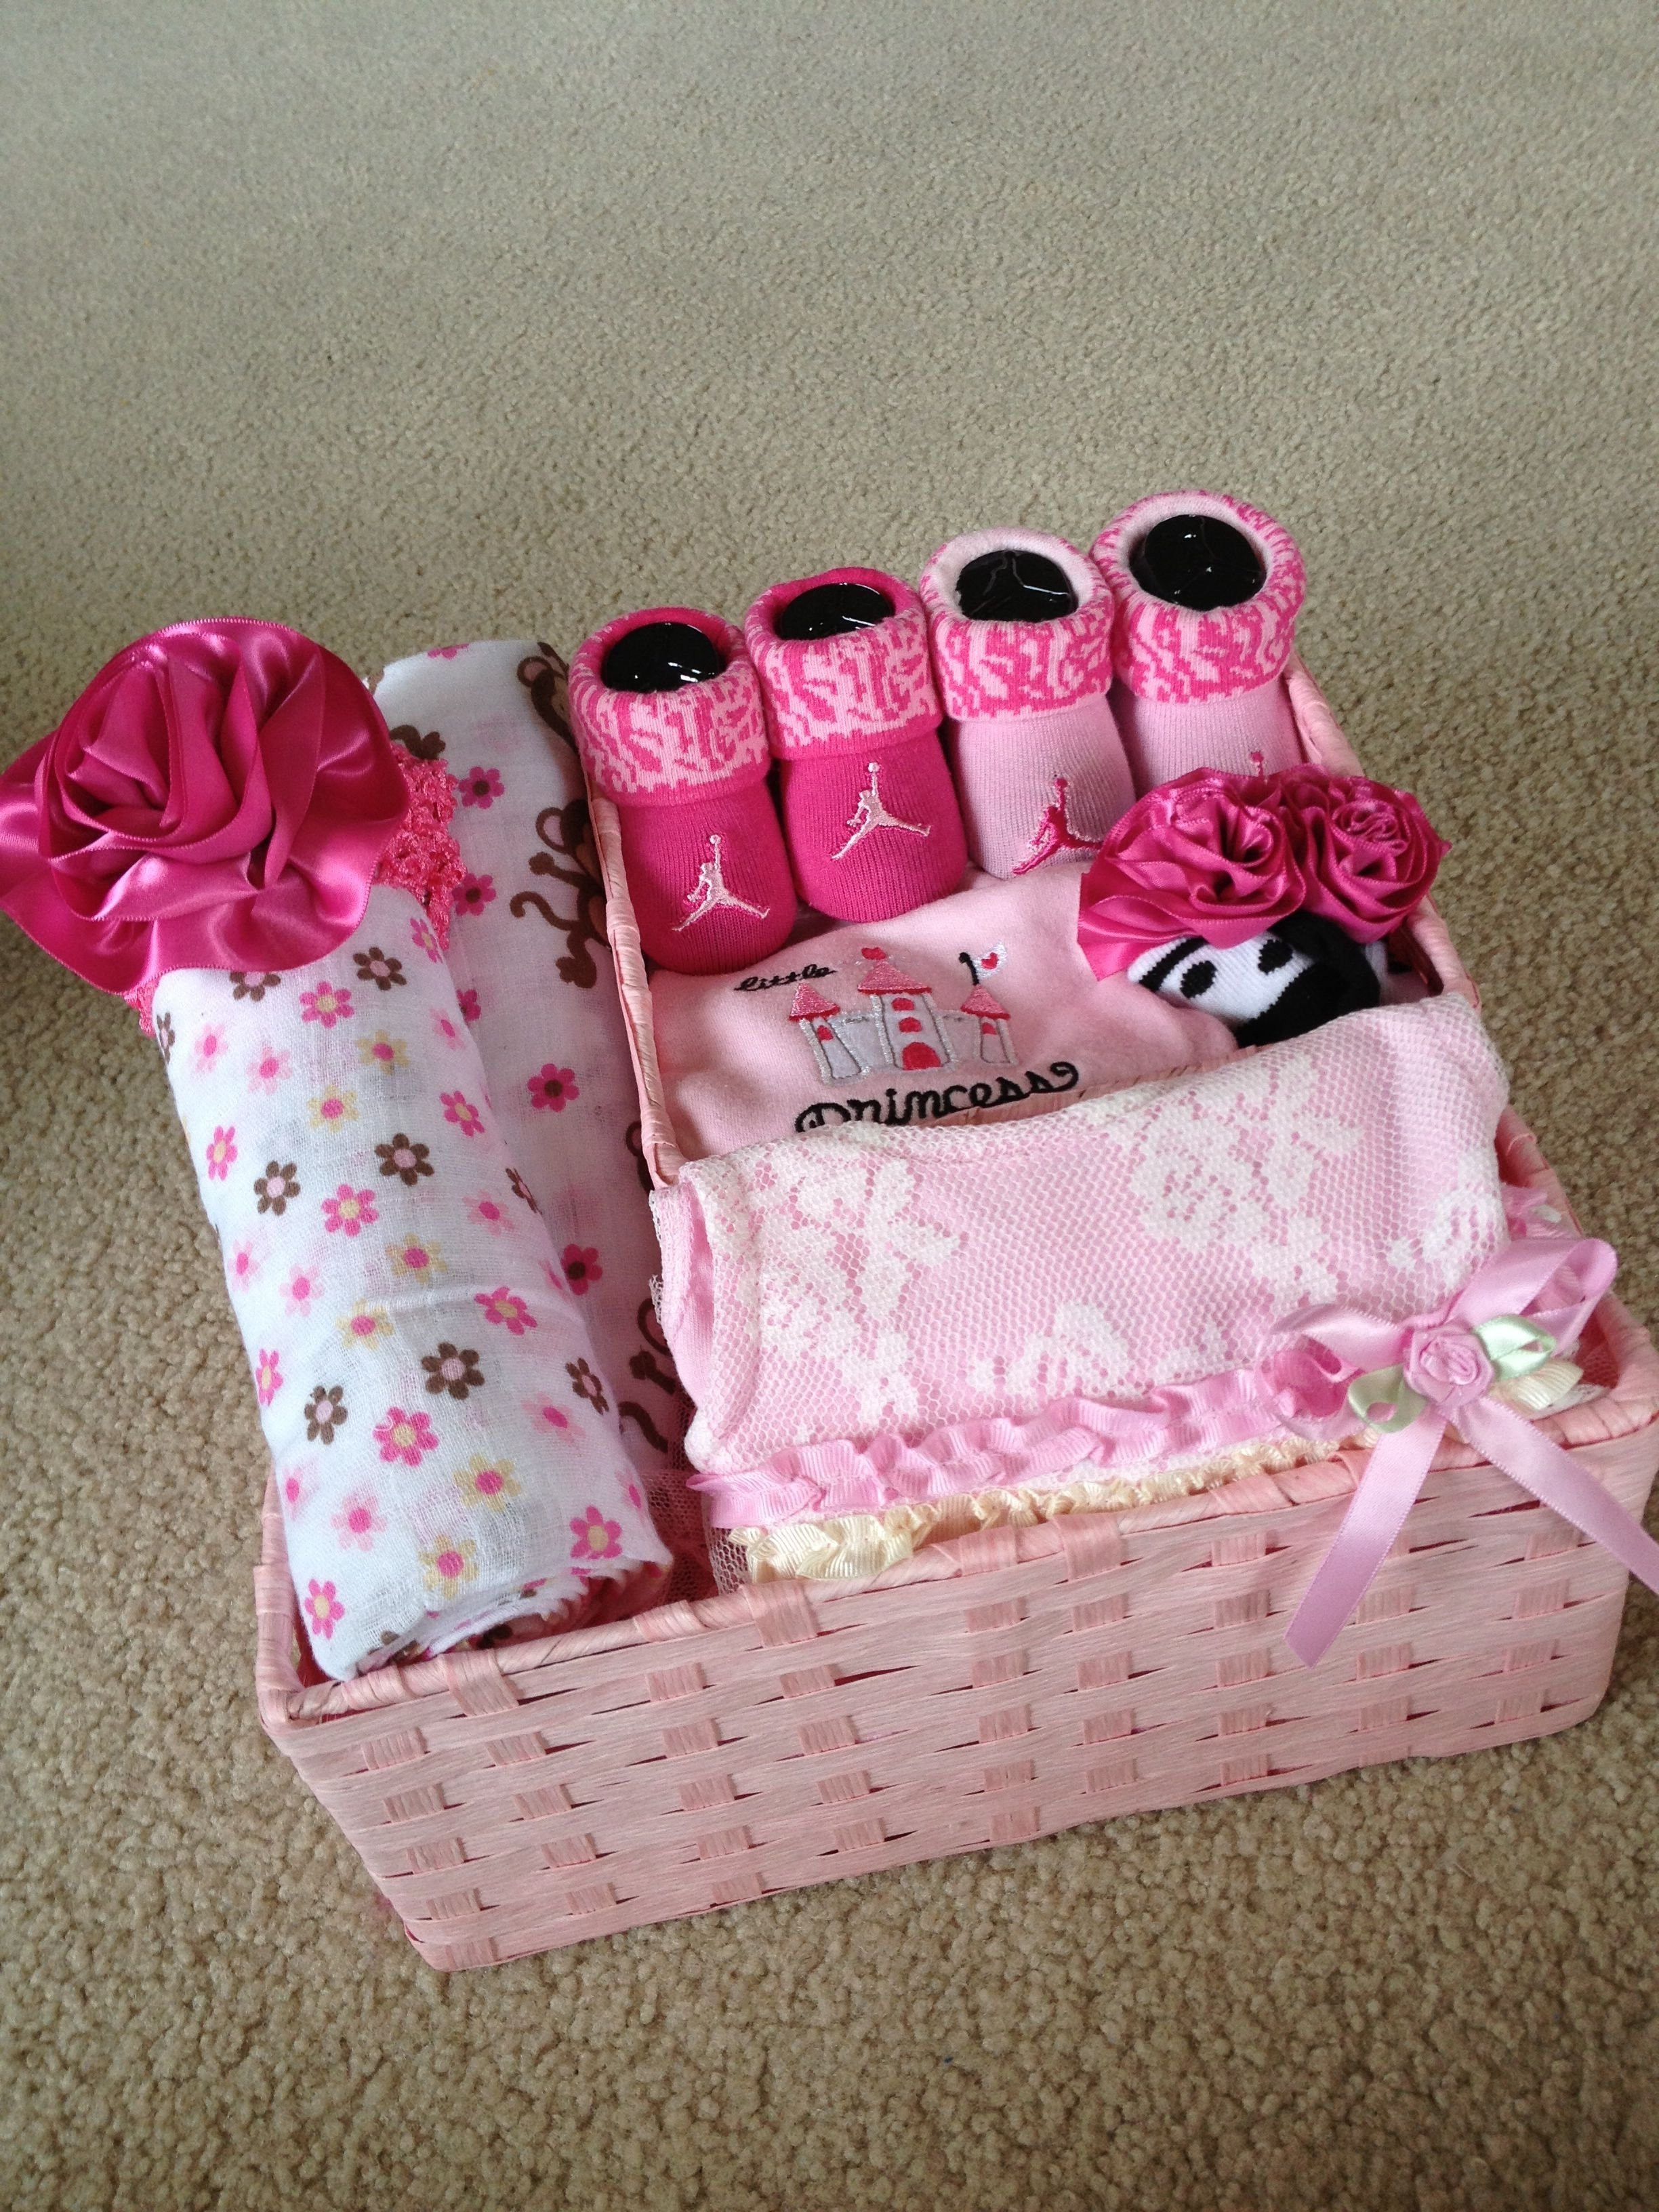 10 Lovable Baby Girl Gift Basket Ideas baby girl gift basket gift baskets pinterest baby girl gift